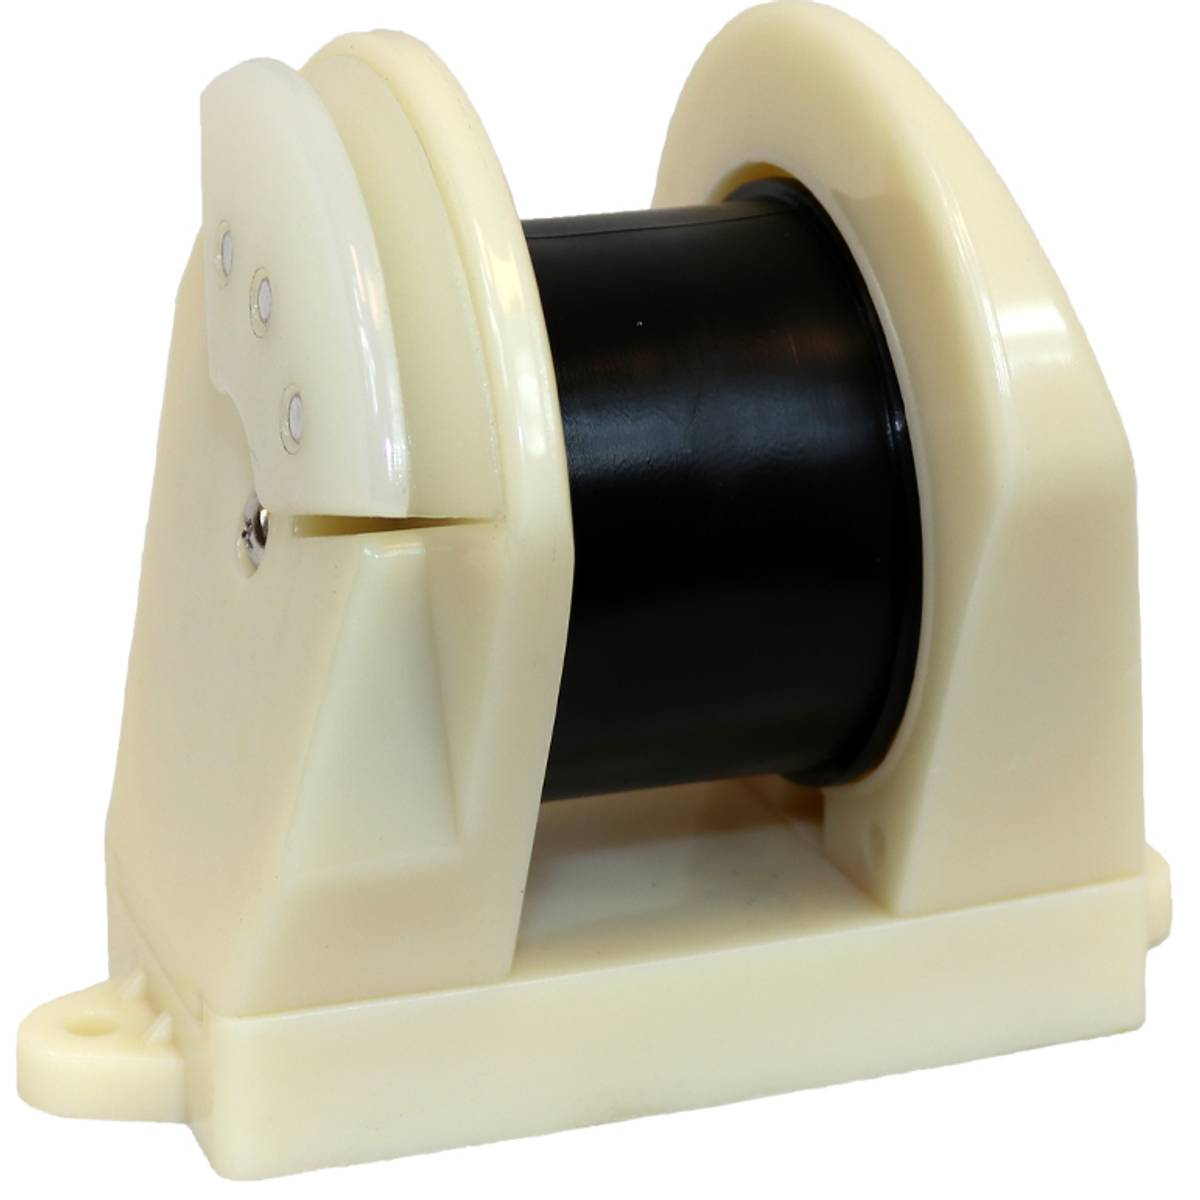 Vabein / rekkehjul plast